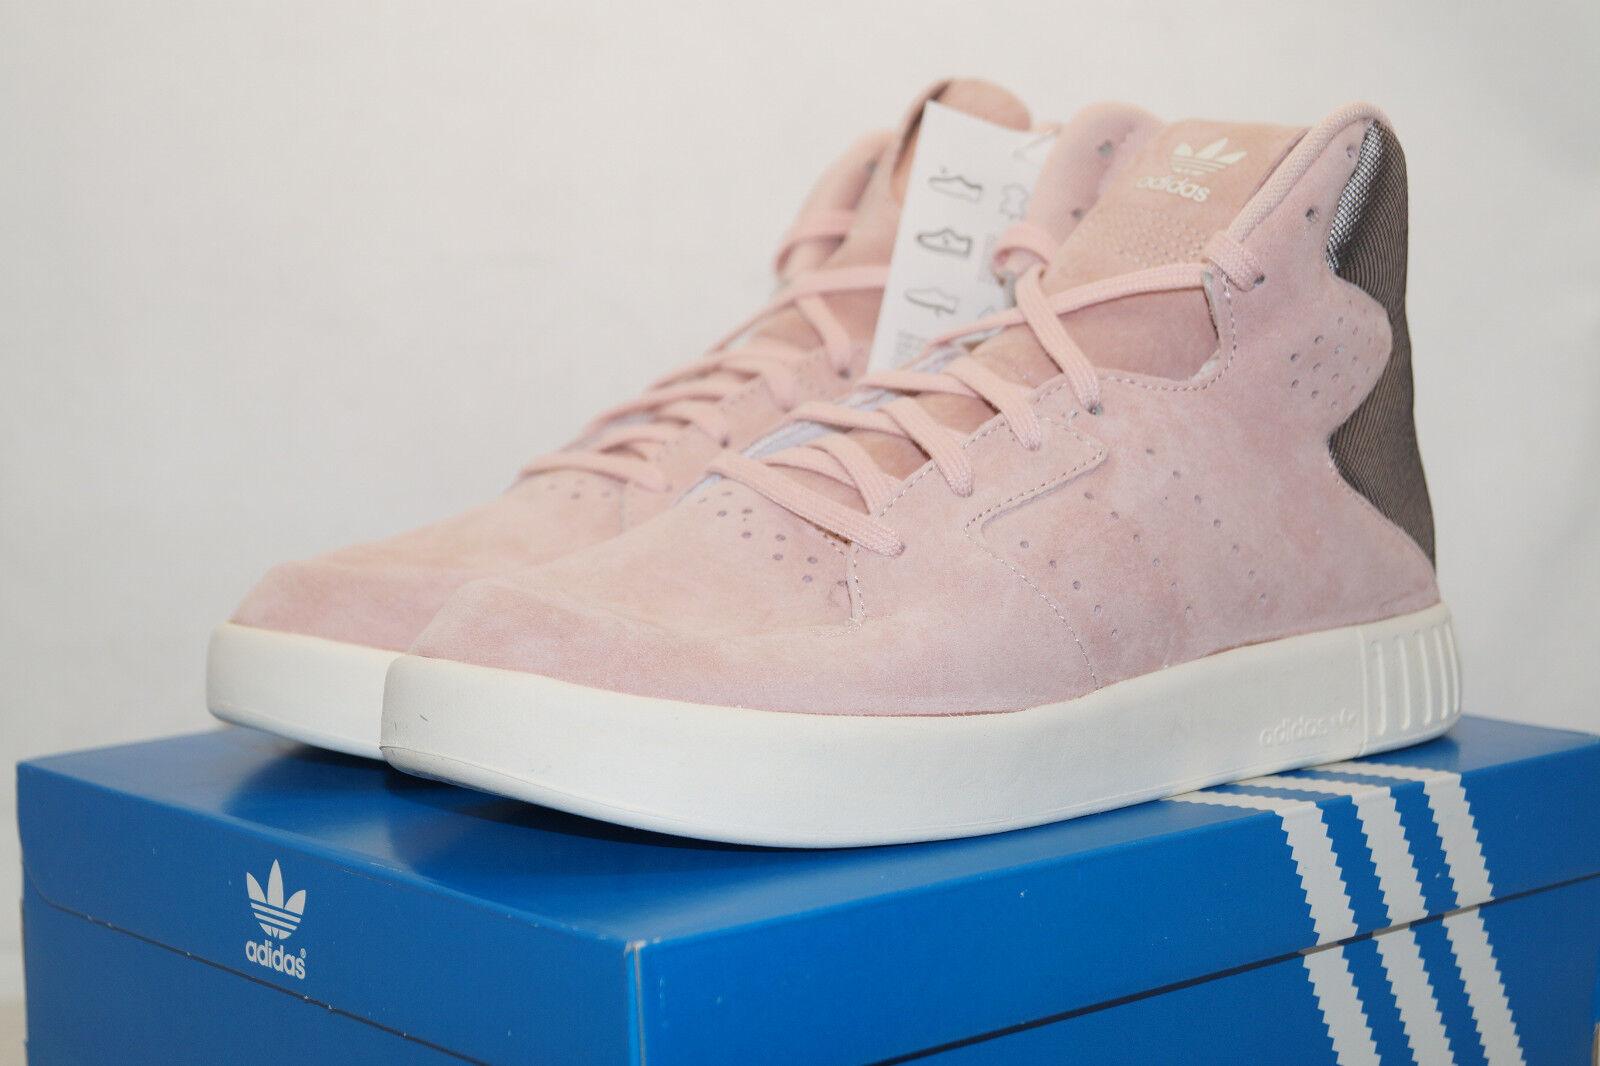 adidas originals TUBULAR INVADER 2.0 W 38.6 UK 5.5 pink S80555 Sneakers